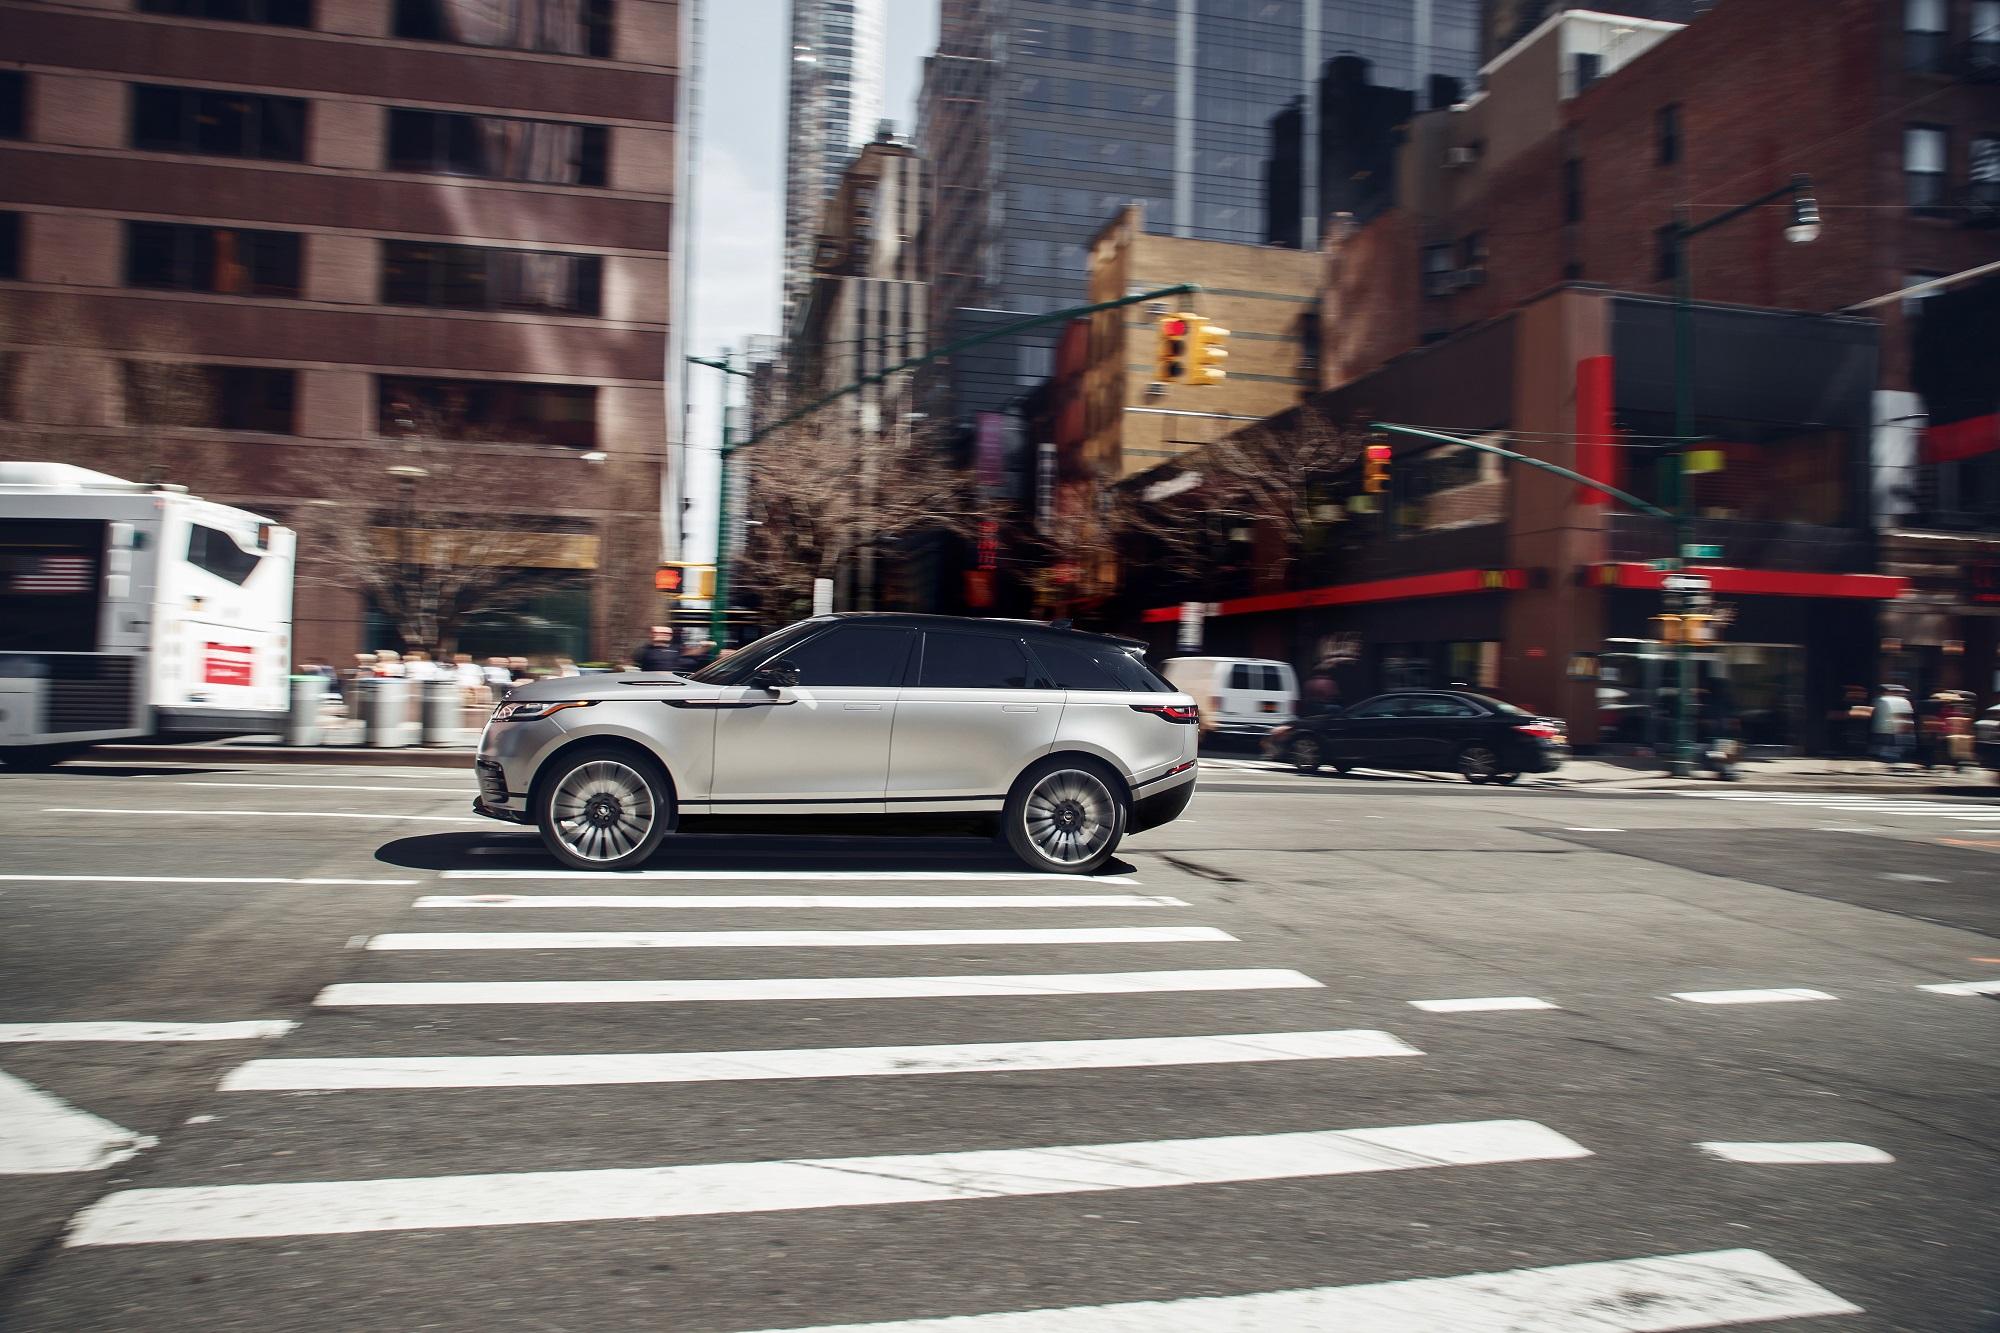 jaguarforums.com Land Rover Range Rover Velar Award MotorWeek